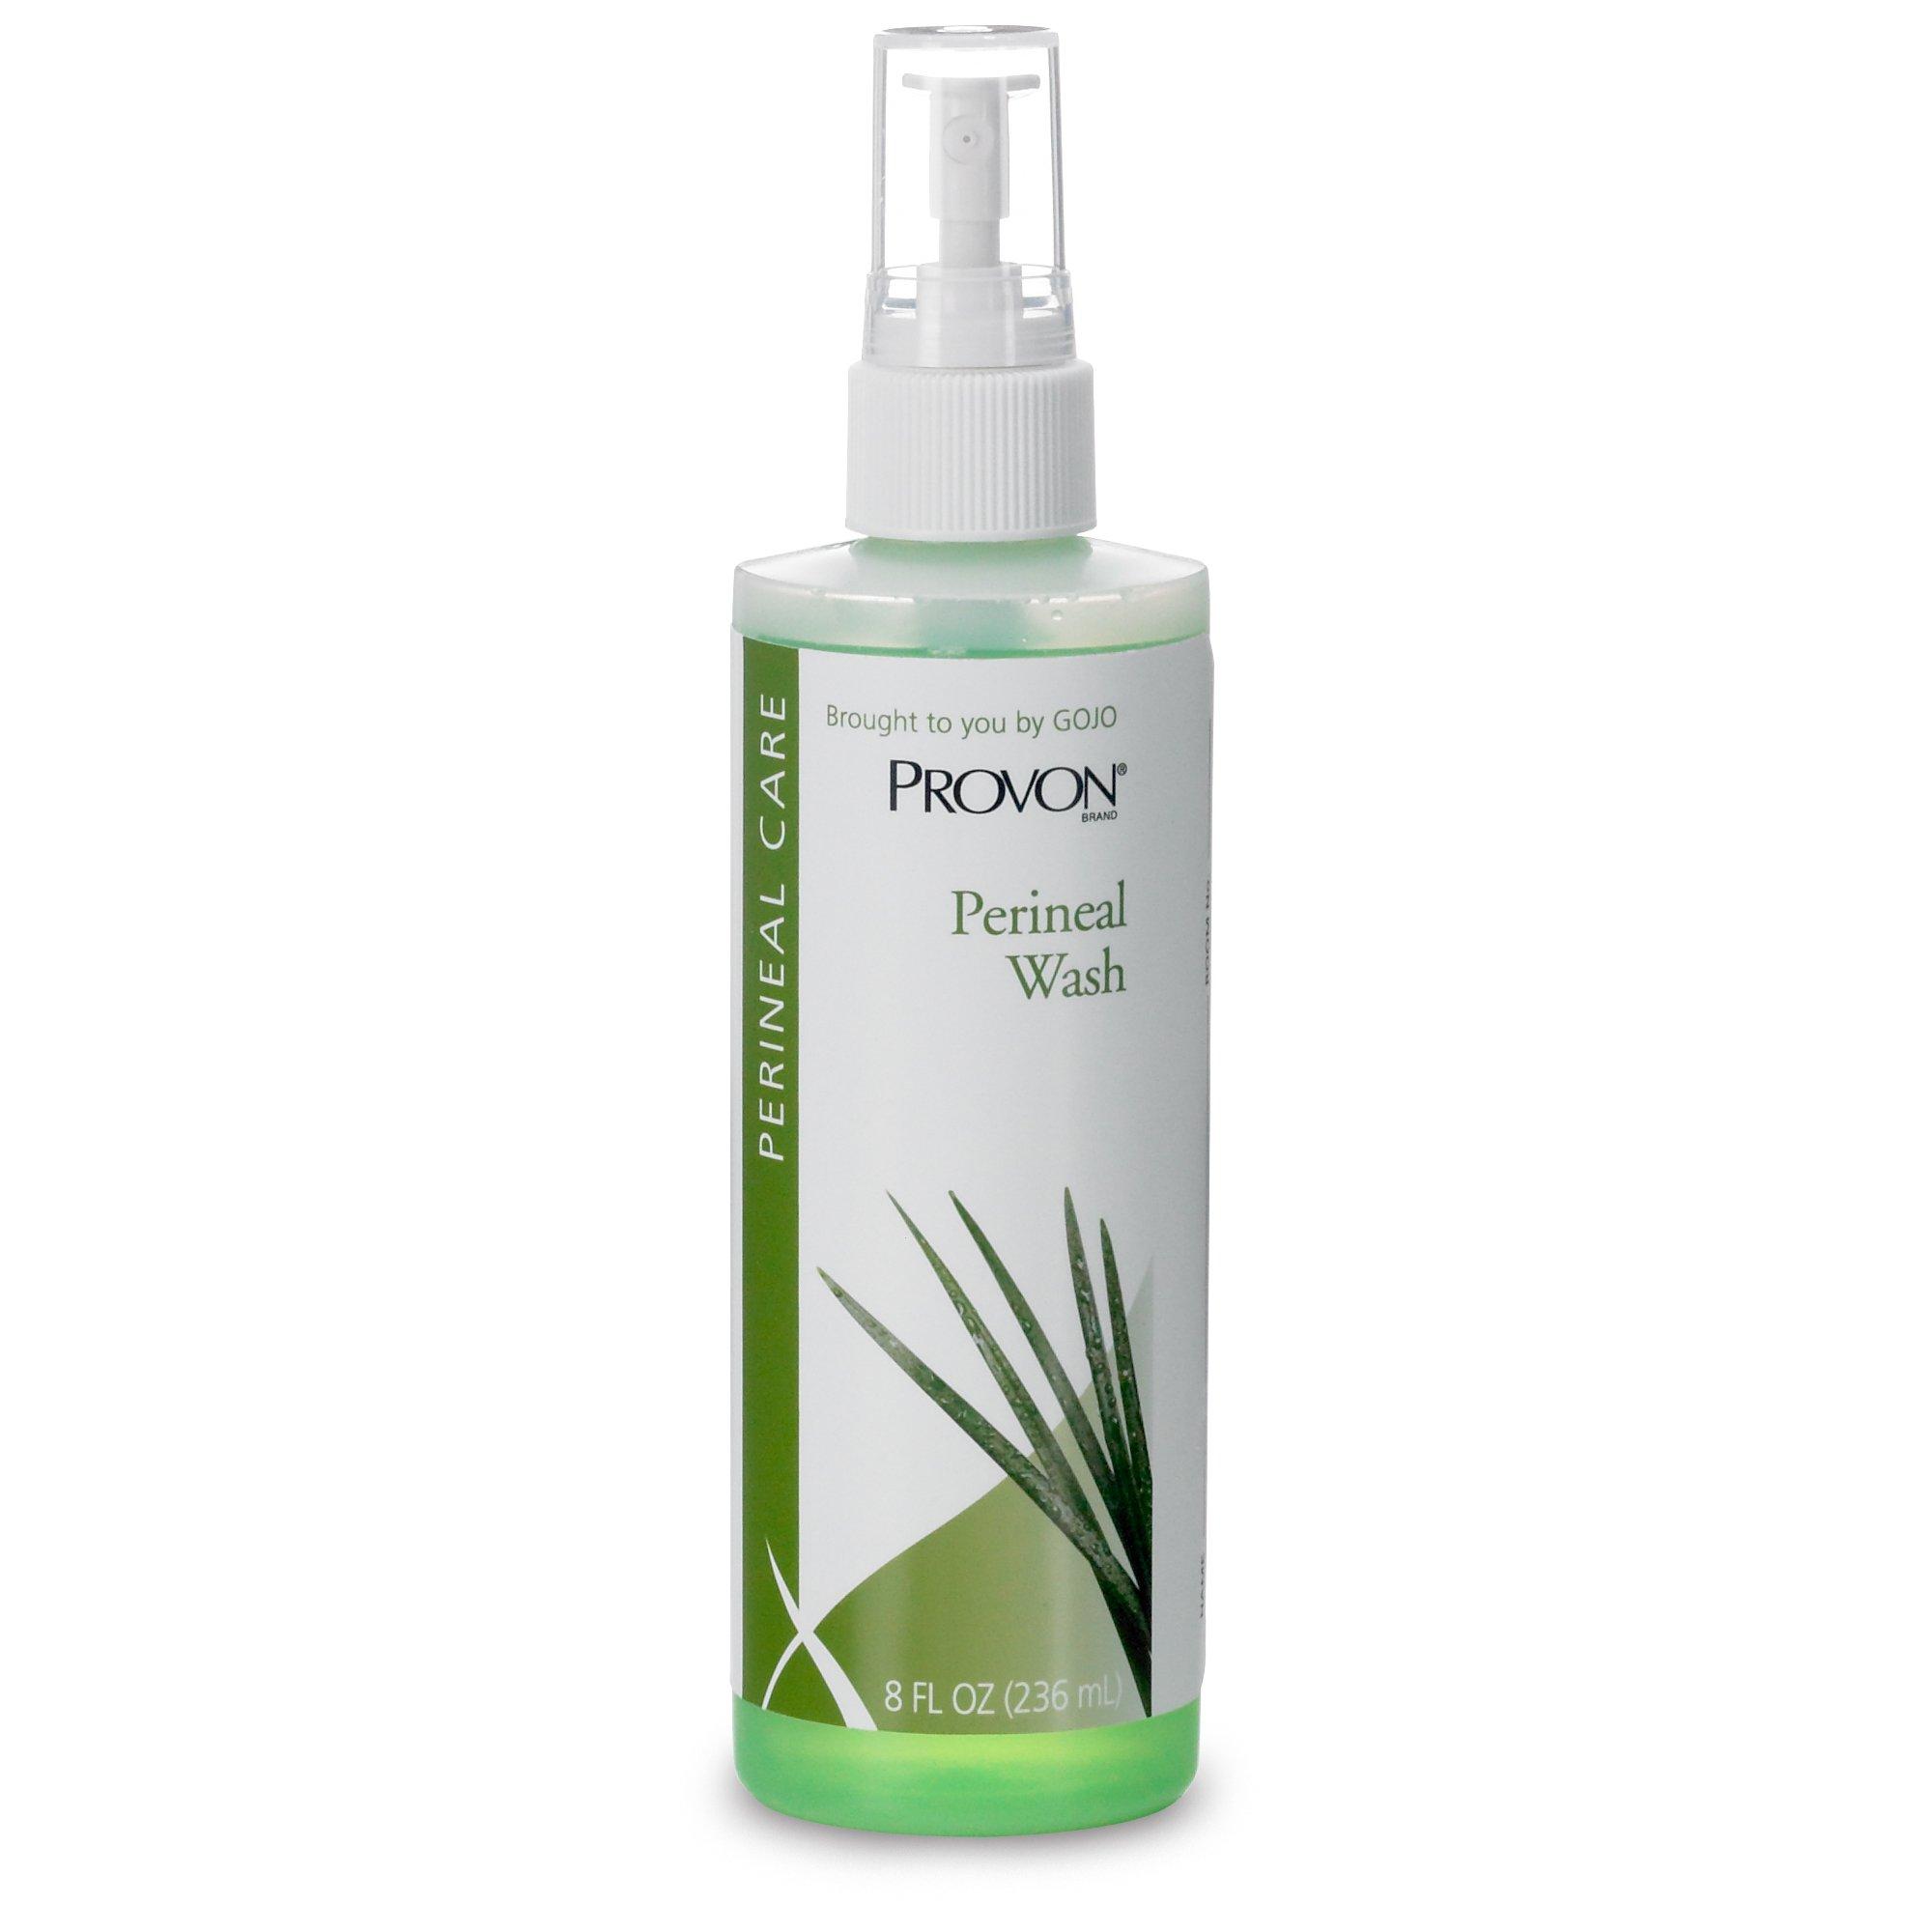 PROVON 4525-48 Perineal Wash, 8 fl. oz. Spray Bottle, Herbal Fragrance (Case of 48) by Provon